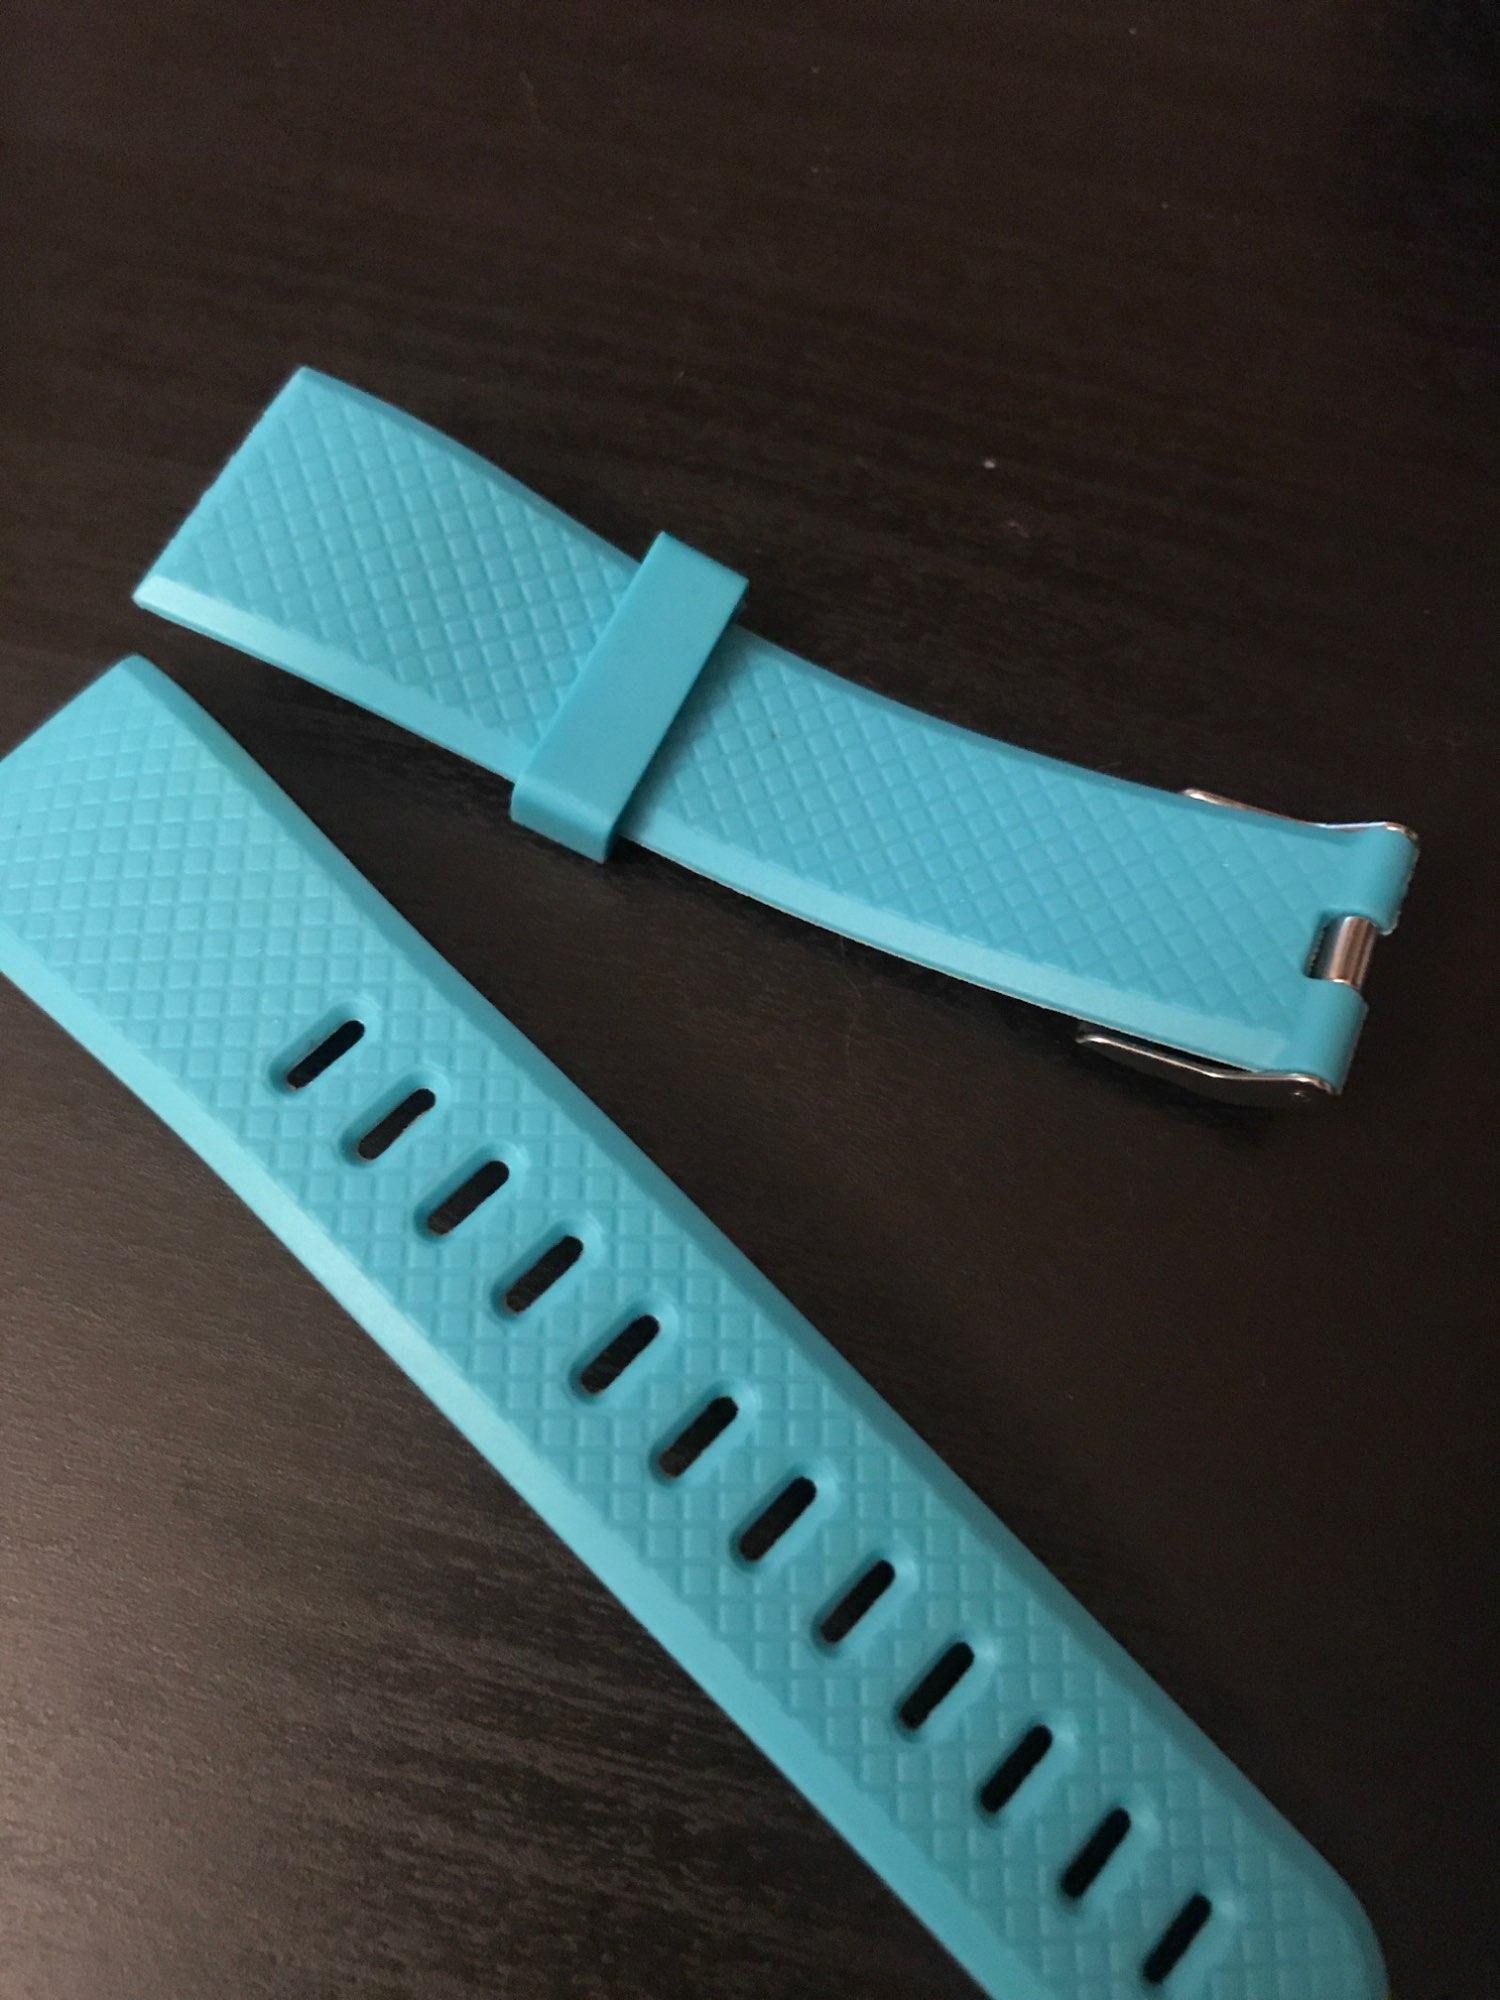 Digital Smart sport watch men's watches digital led electronic wristwatch Bluetooth fitness wristwatch women kids hours hodinky photo review